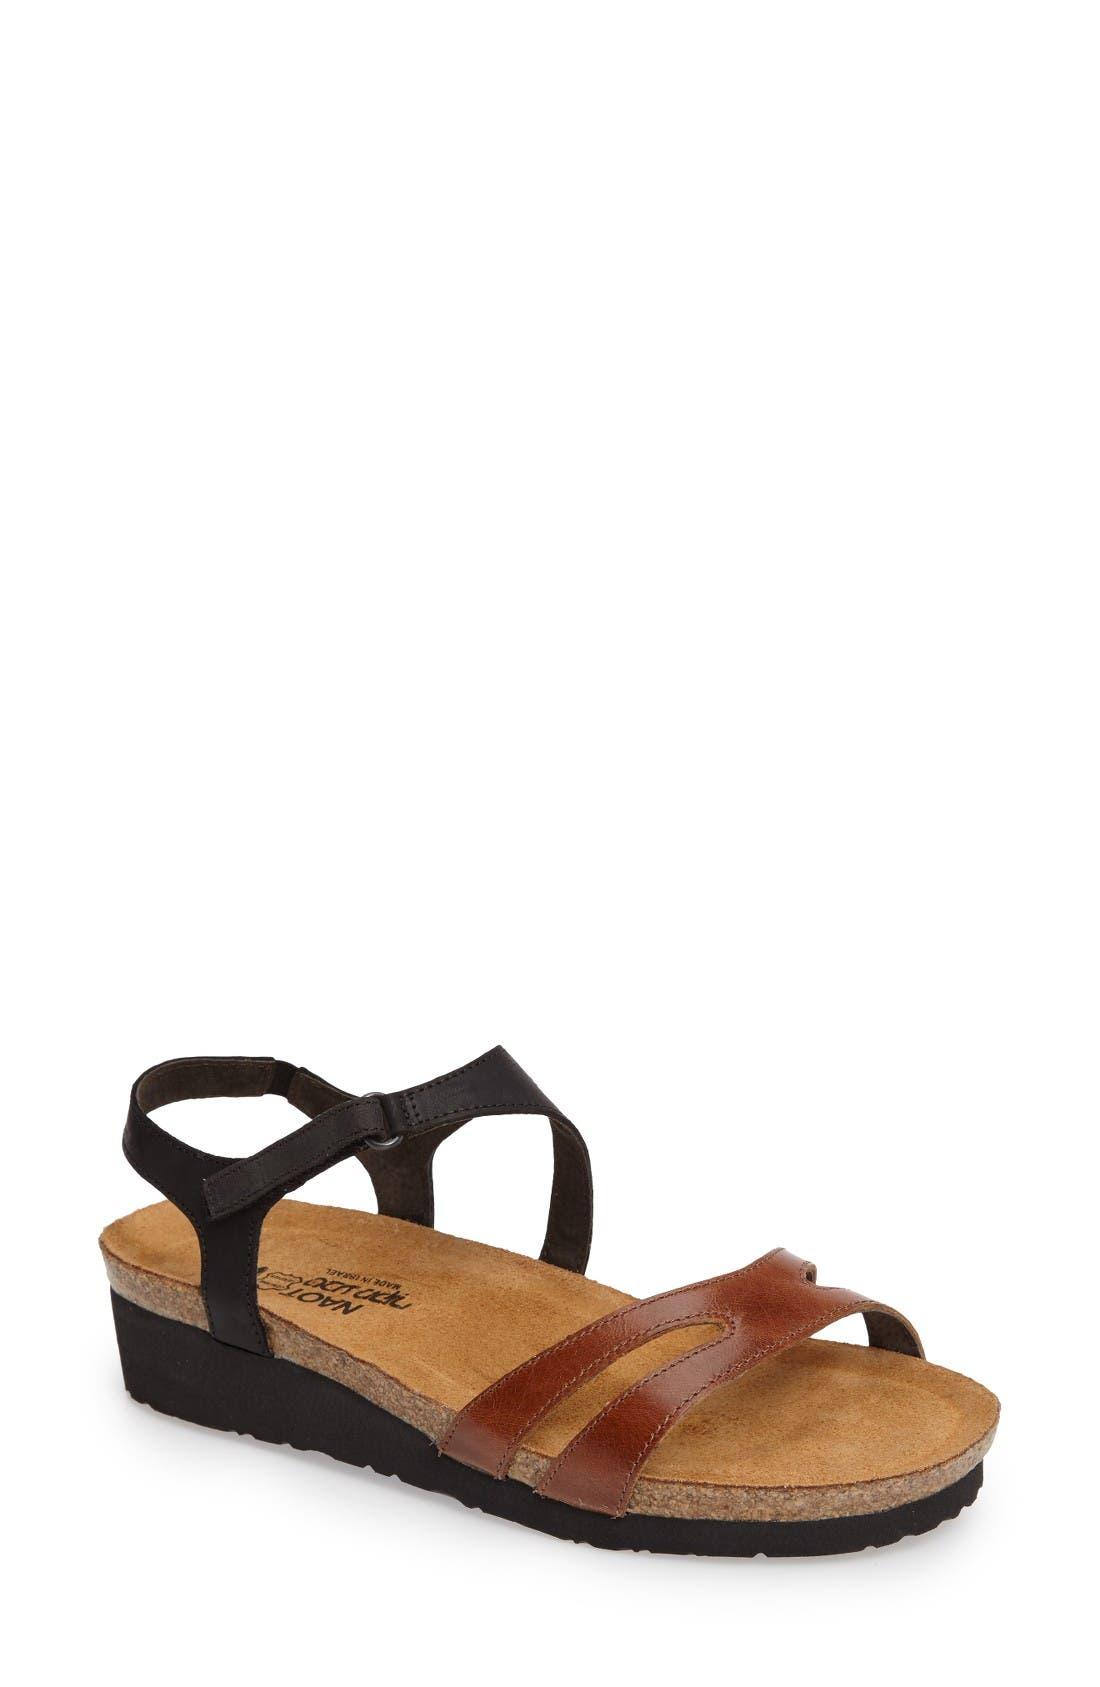 Janis Sandal,                         Main,                         color, Brown/ Black Leather